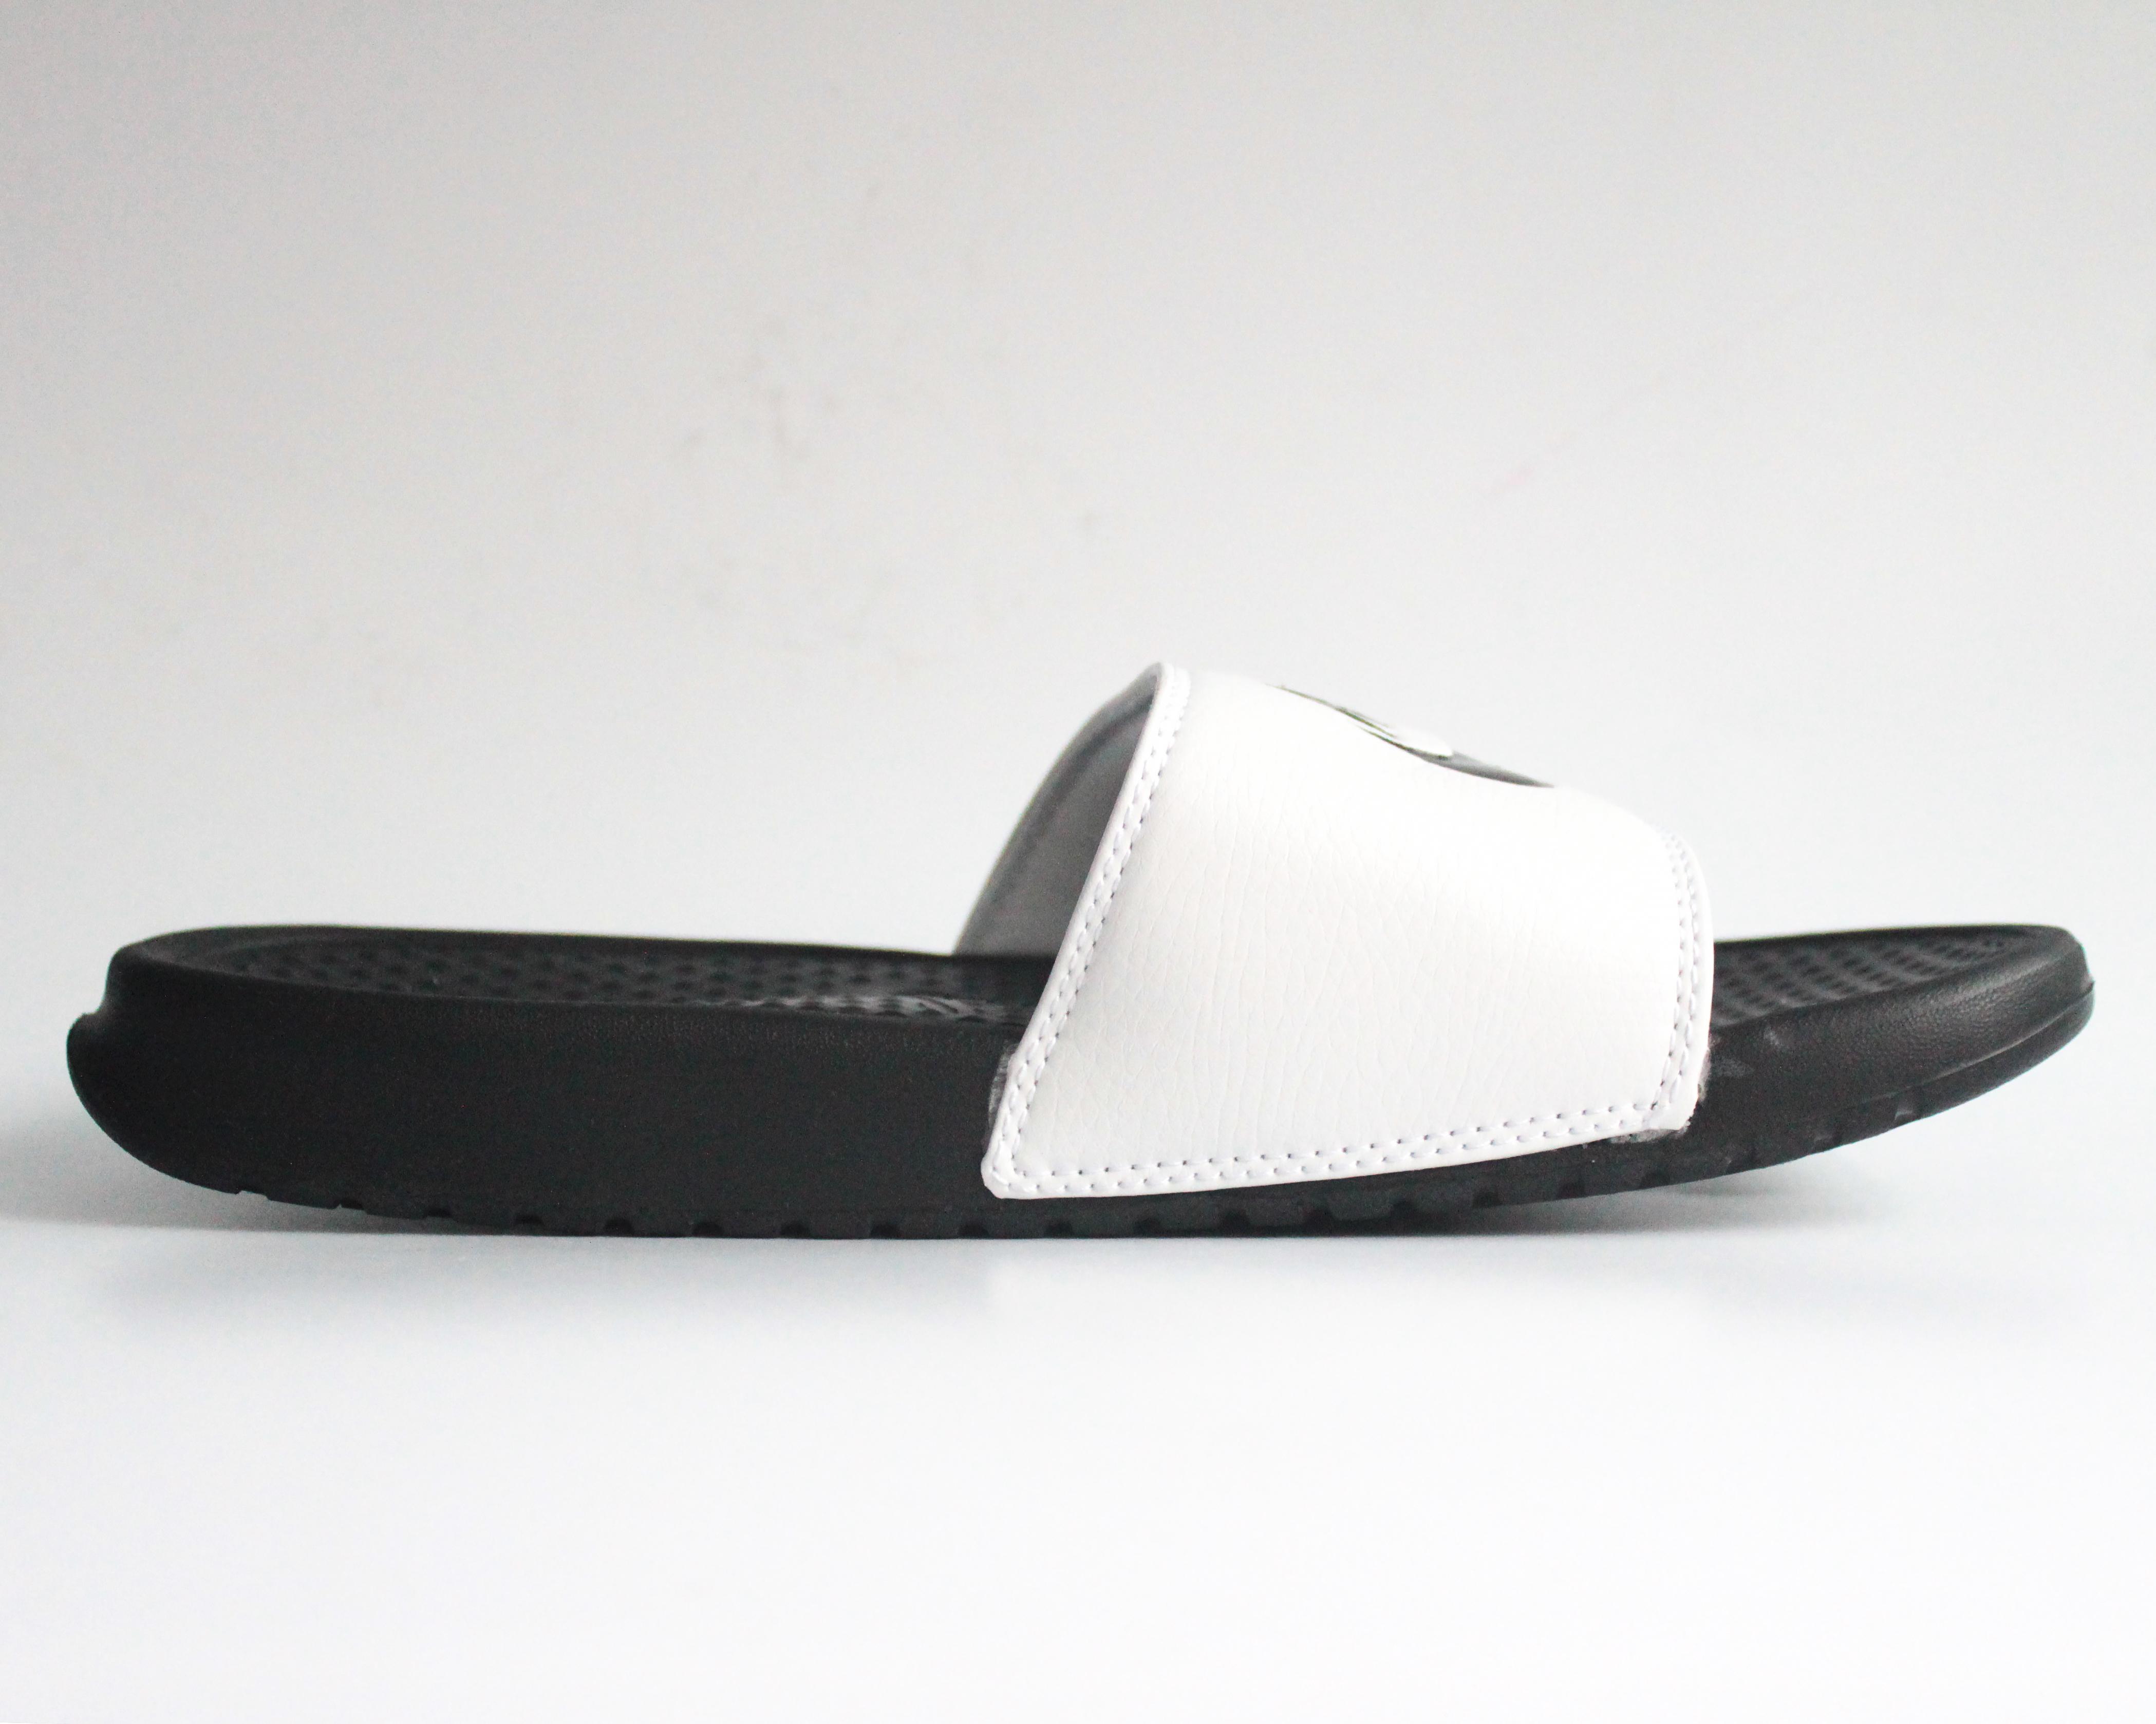 Negra Blancas Con Nike Sandalias Mgshops Suela lFJTKc1